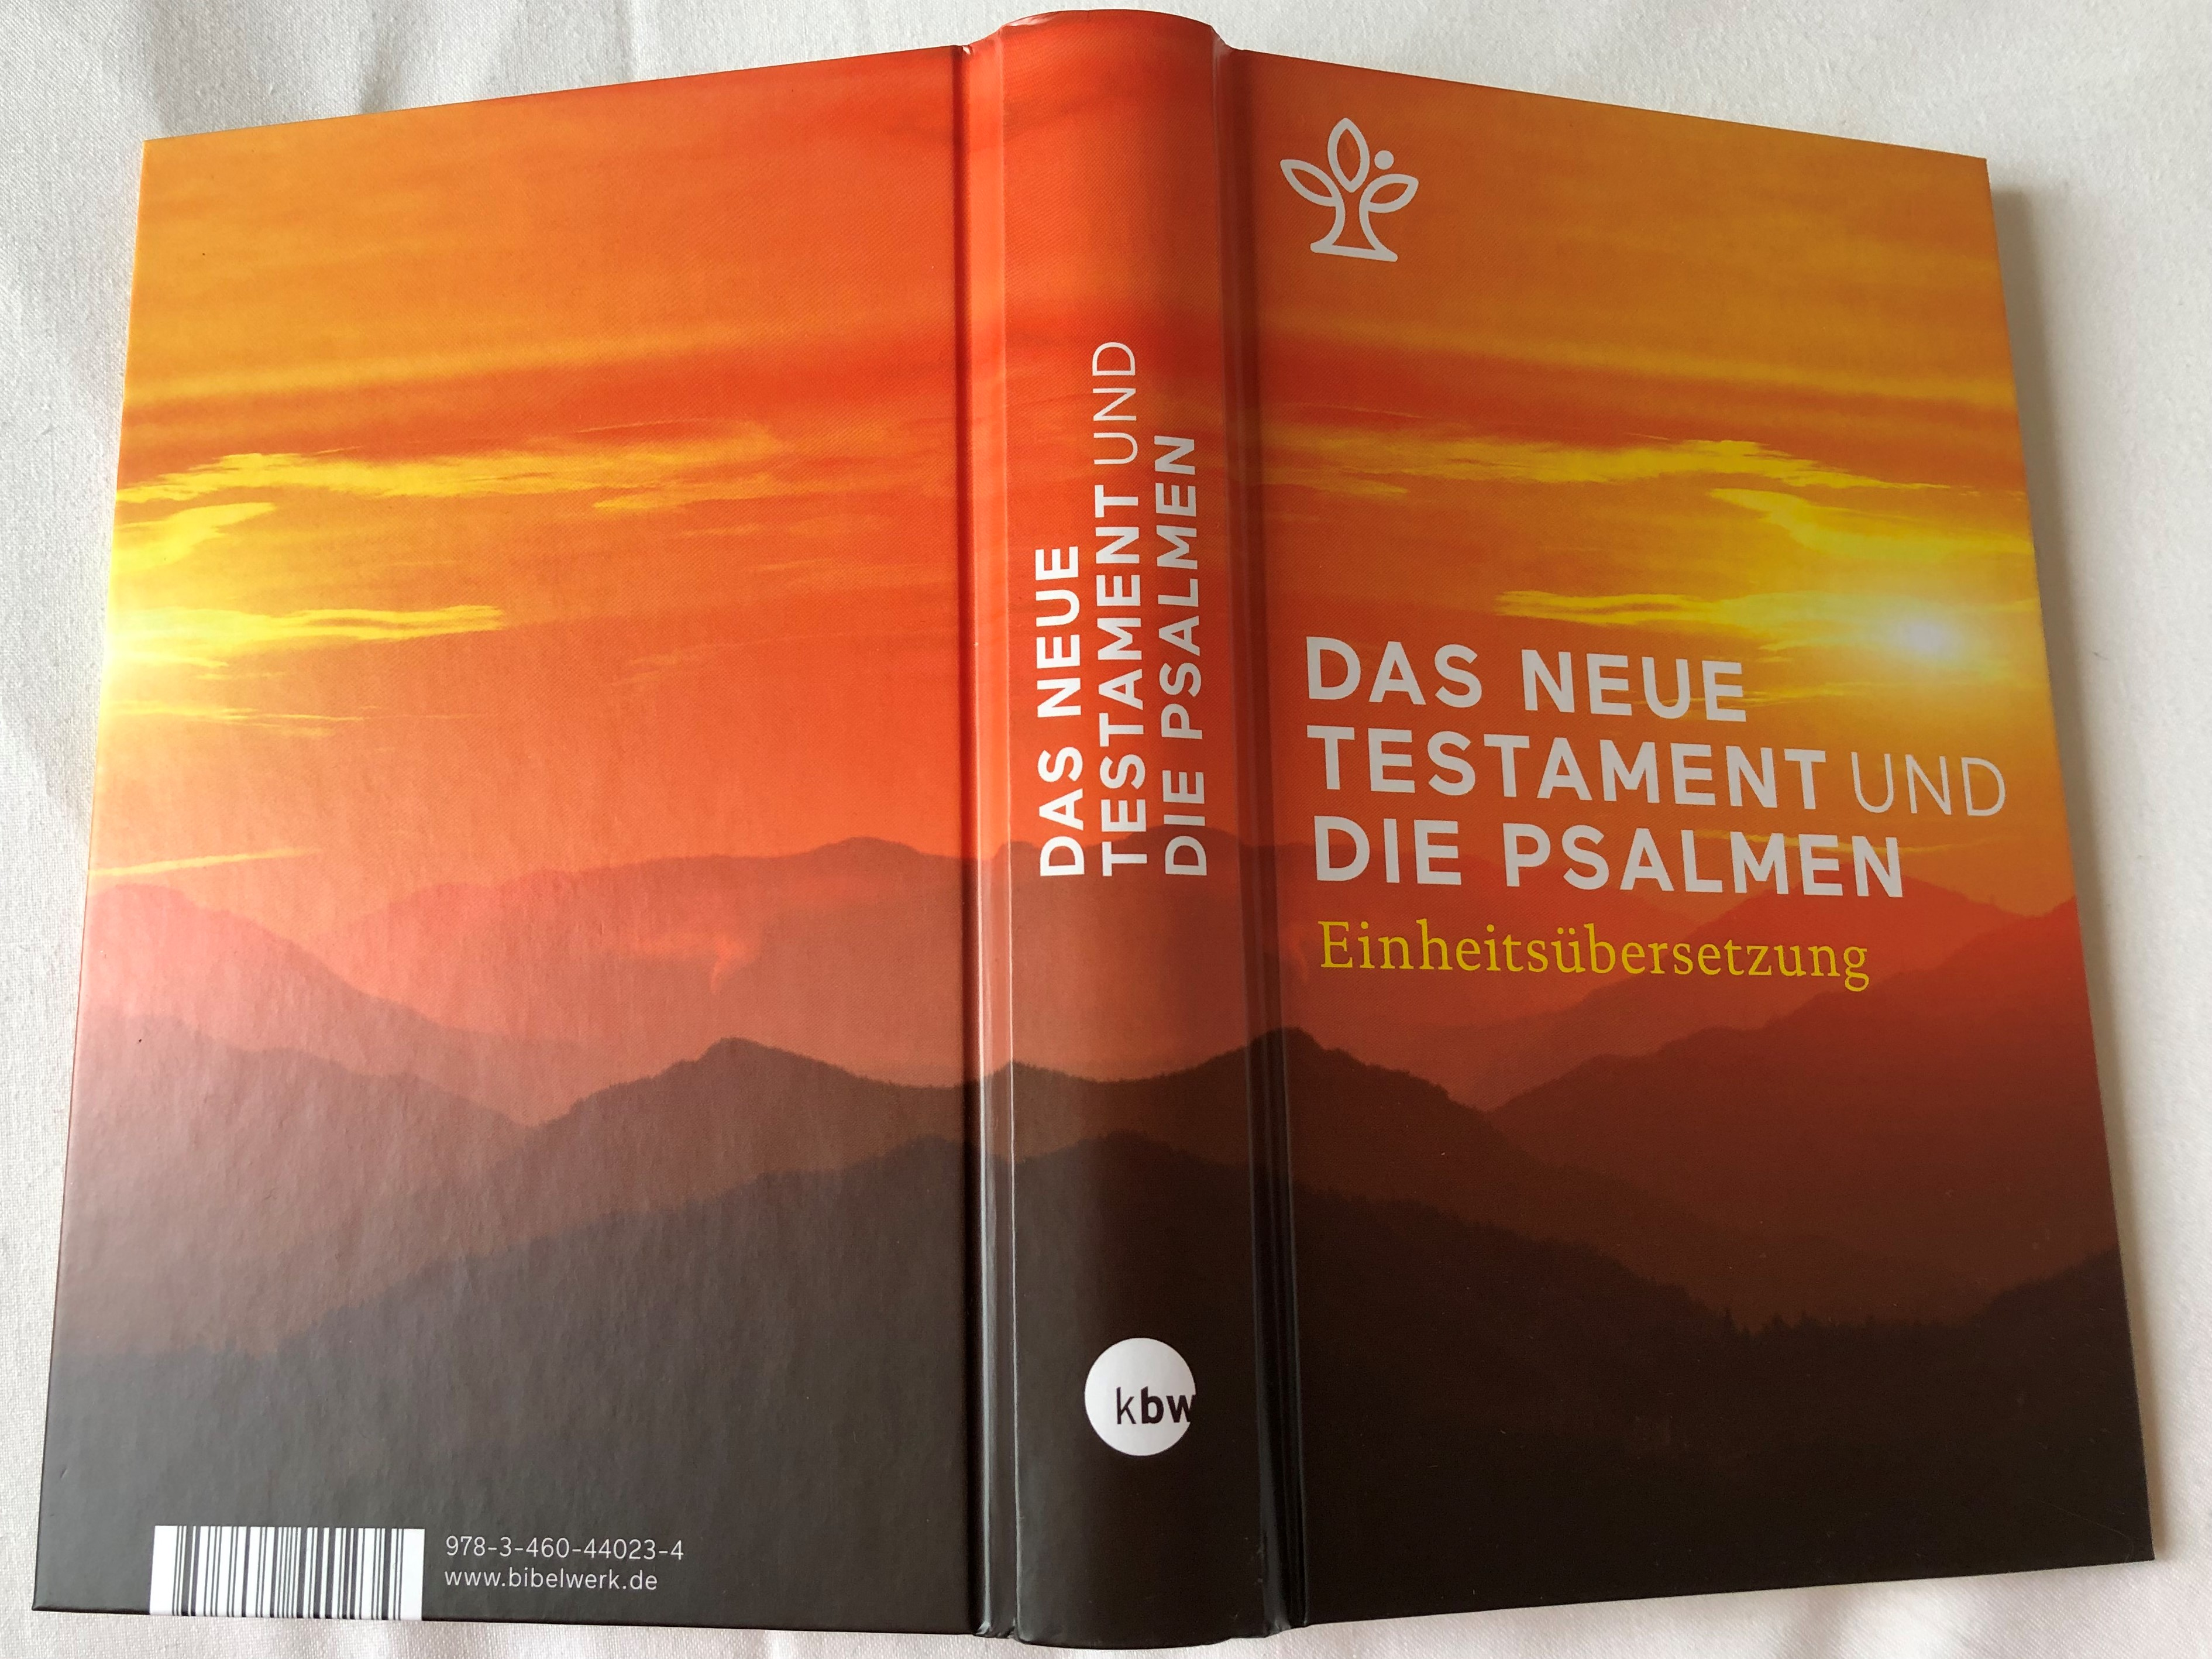 das-neue-testament-und-die-psalmen-einheits-bersetzung-german-language-new-testament-and-psalms-unitary-translation-book-introductions-references-notes-and-maps-hardcover-2018-kbw-3-.jpg